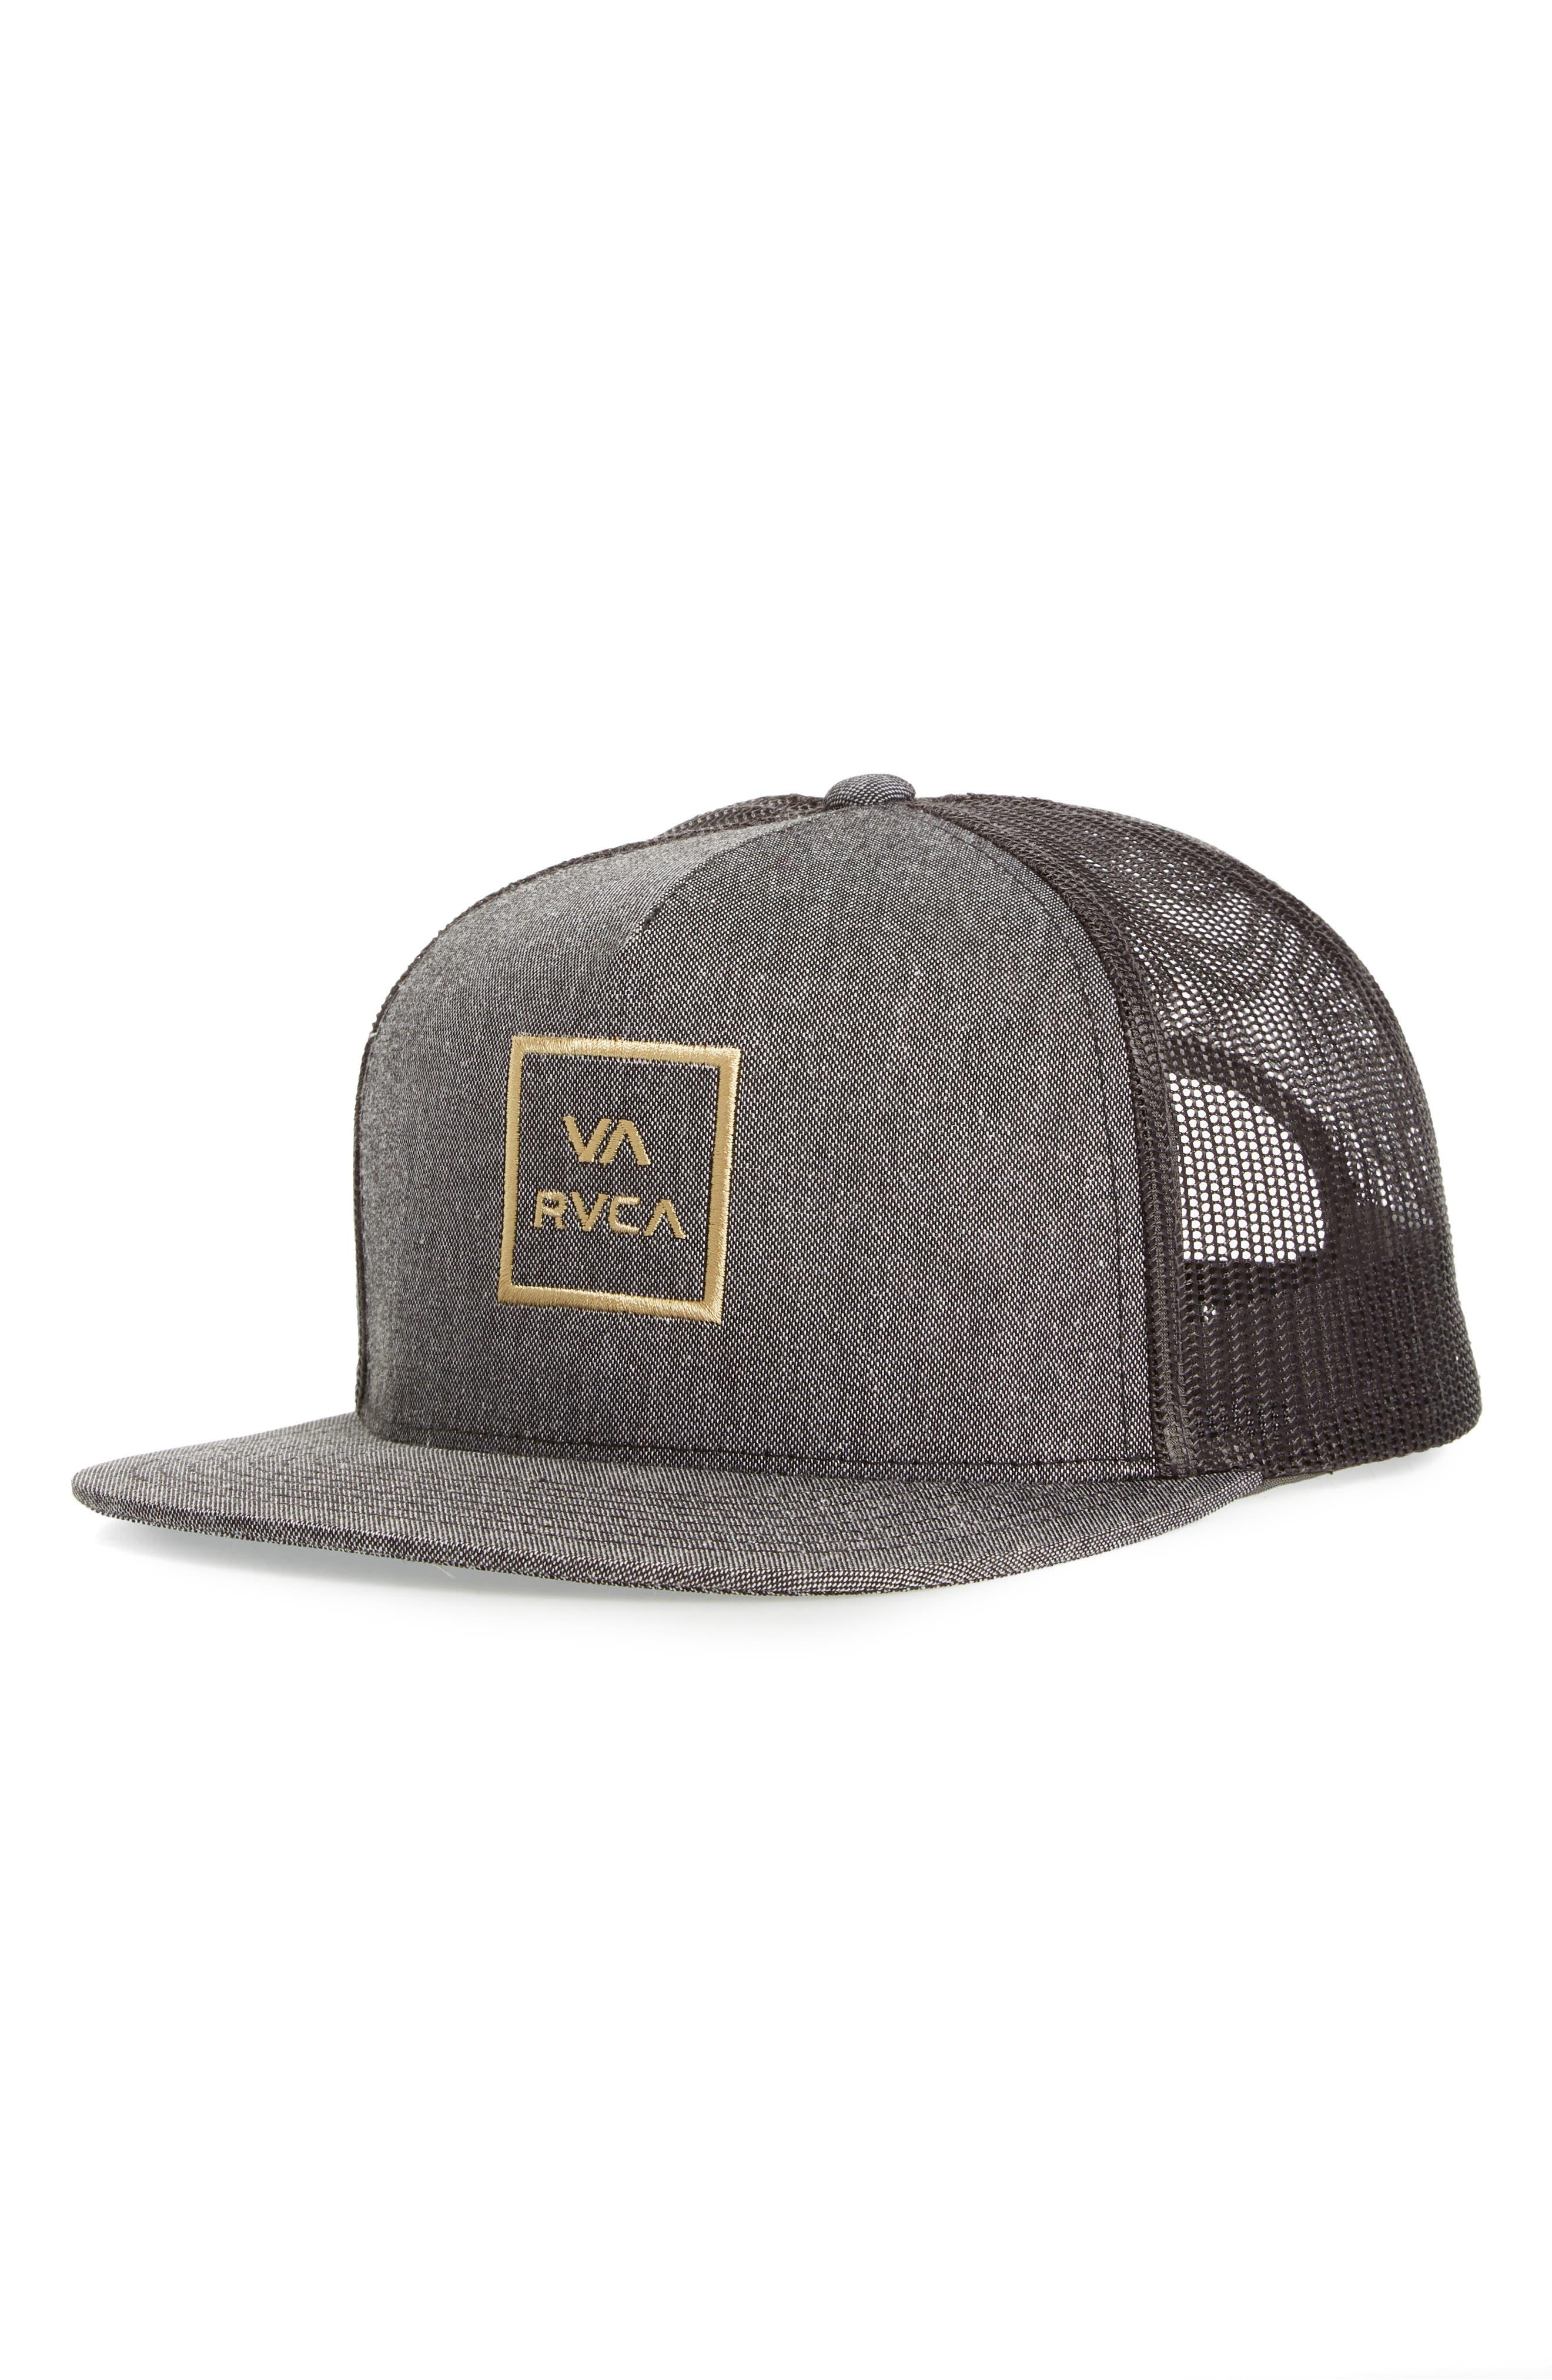 RVCA VA All the Way Trucker Hat, Main, color, DARK CHARCOAL HEATHER